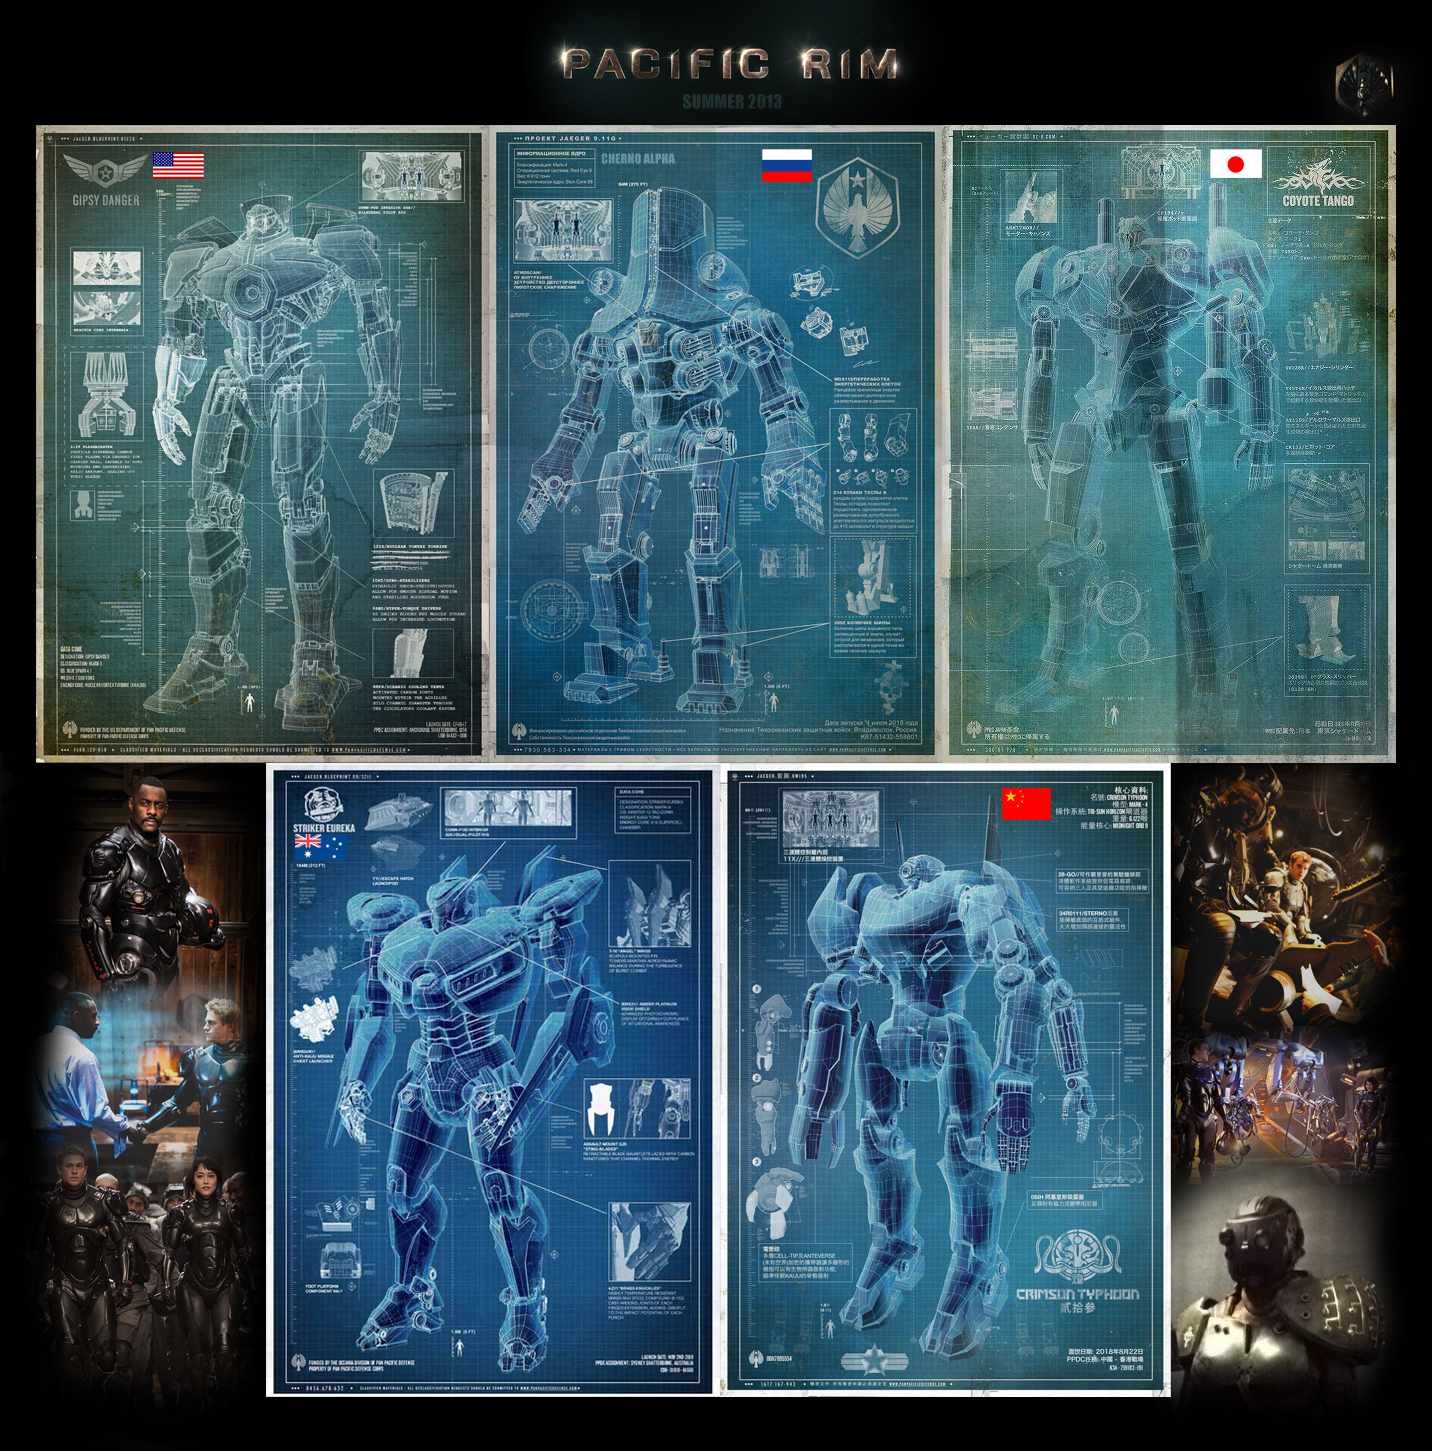 Pacific Rim Robot Design_wallpaper